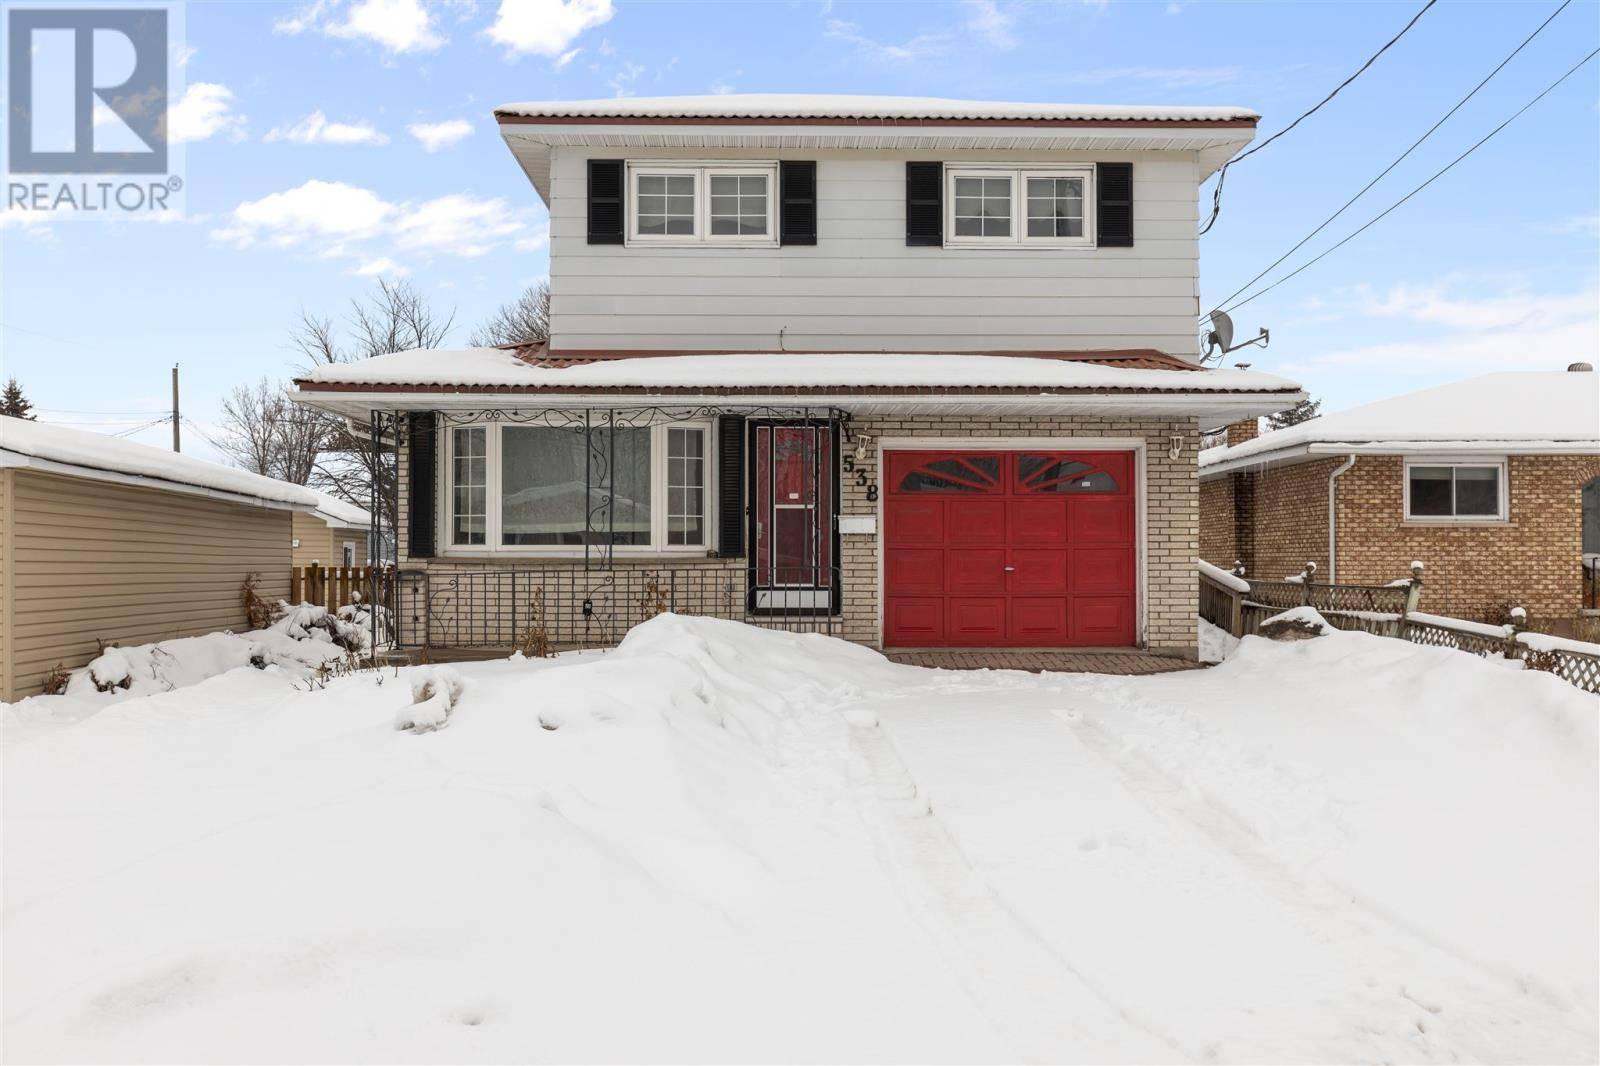 House for sale at 538 Korah Rd Sault Ste. Marie Ontario - MLS: SM127668